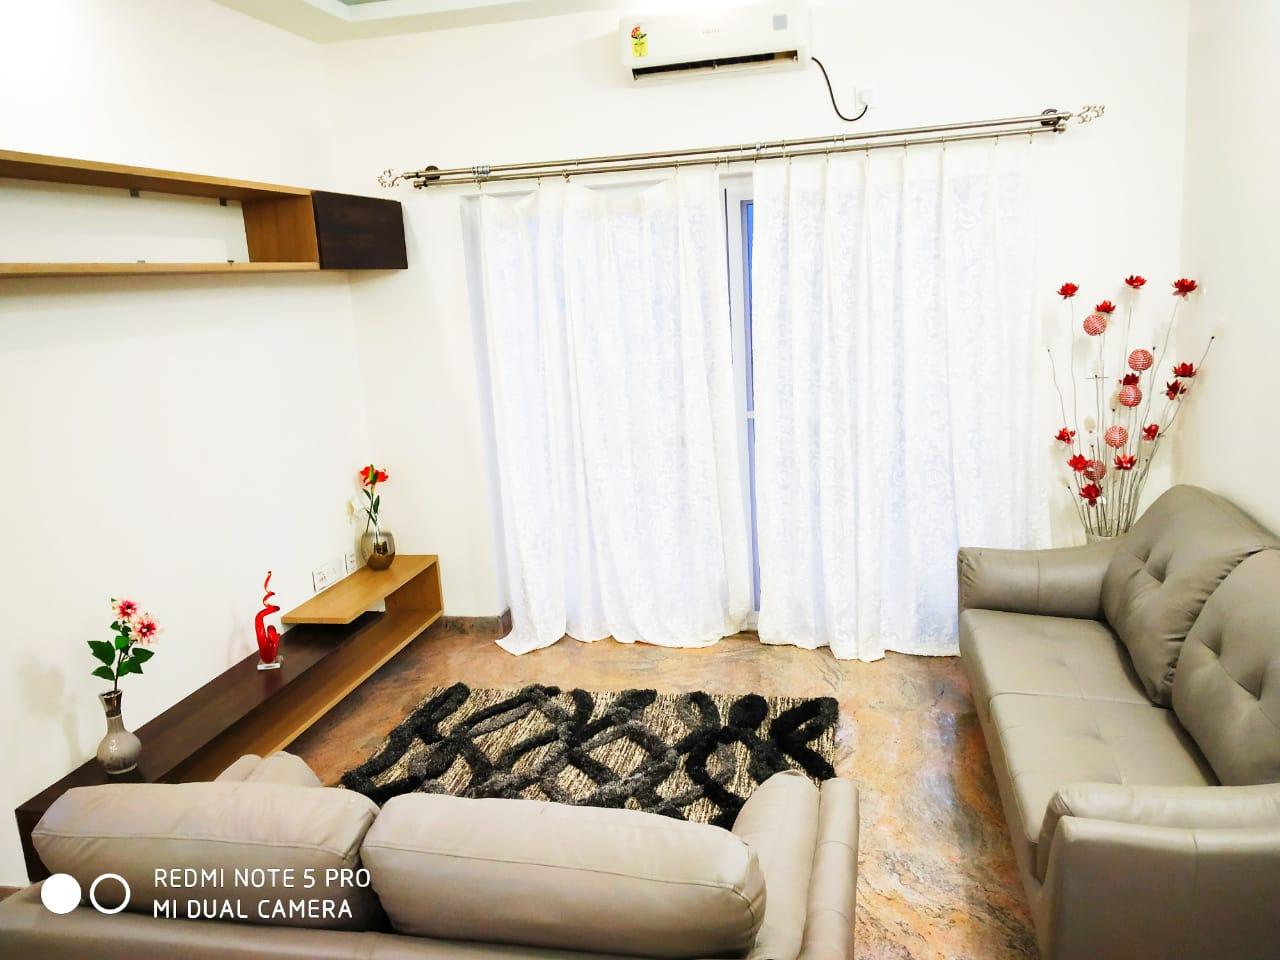 BSCPL-Bollineni-Astra-Kogilu-Cross-Apartments-Bangalore-Gallery-3